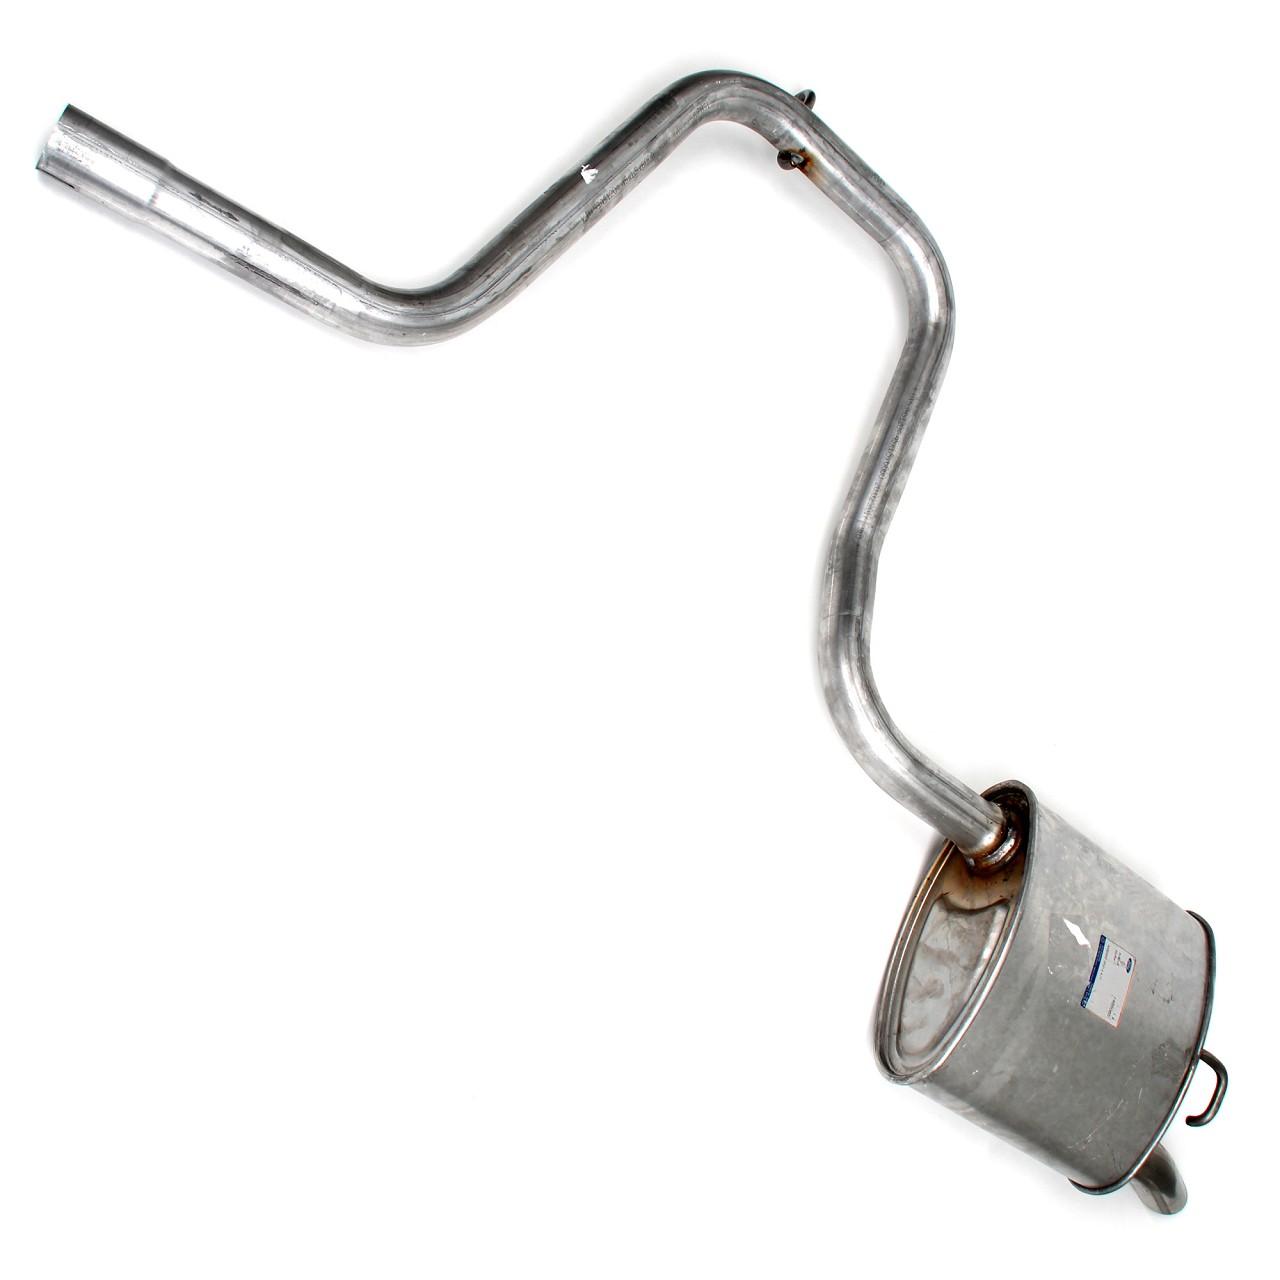 ORIGINAL Ford Endschalldämpfer 1465065 für MONDEO I II 1.6i / 1.8i 16V 88-115 PS